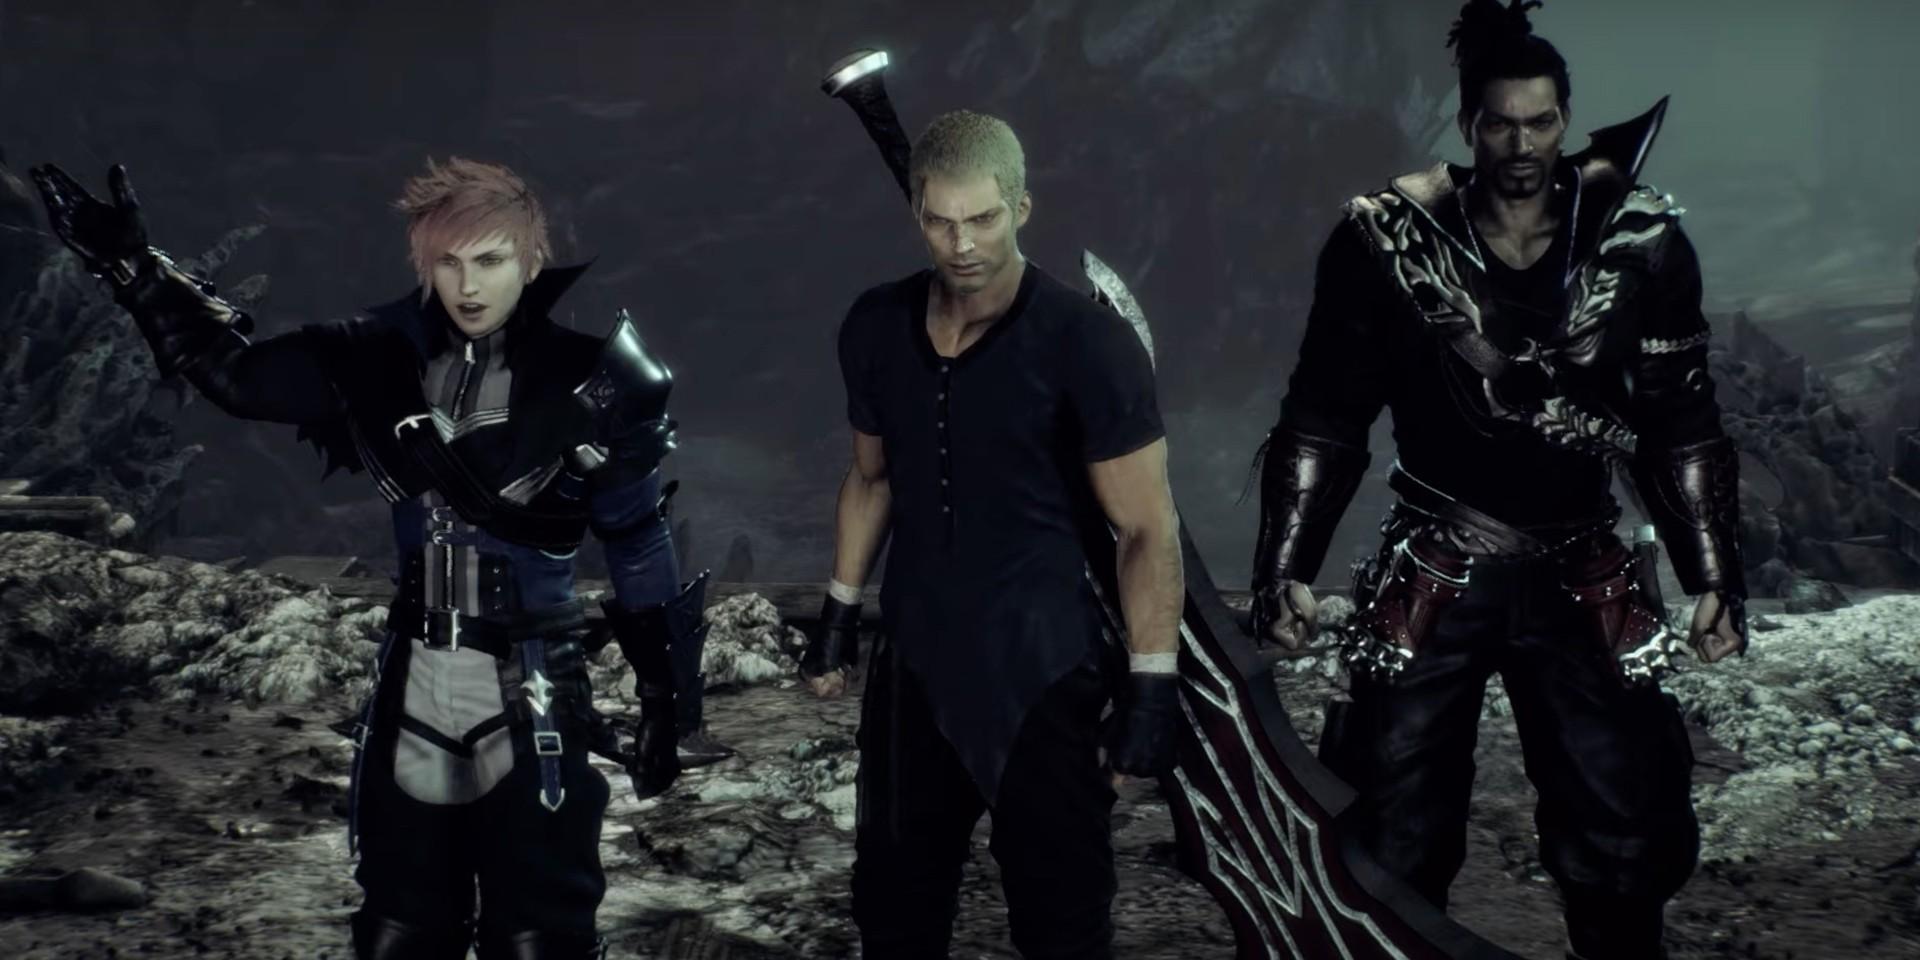 Square Enix announces new action game Stranger of Paradise: Final Fantasy Origin